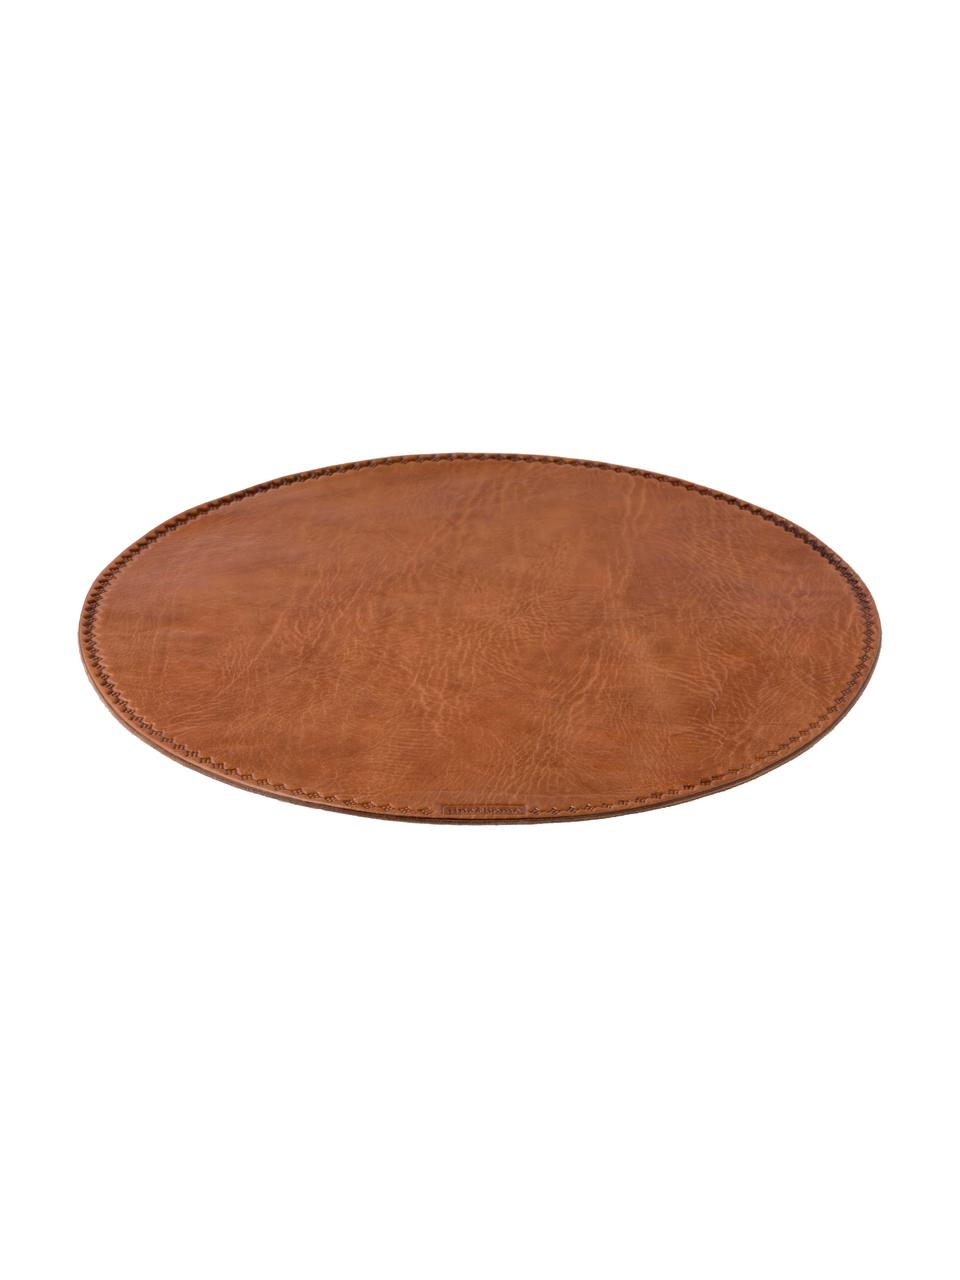 Set de table rond en cuir Lia, Brun